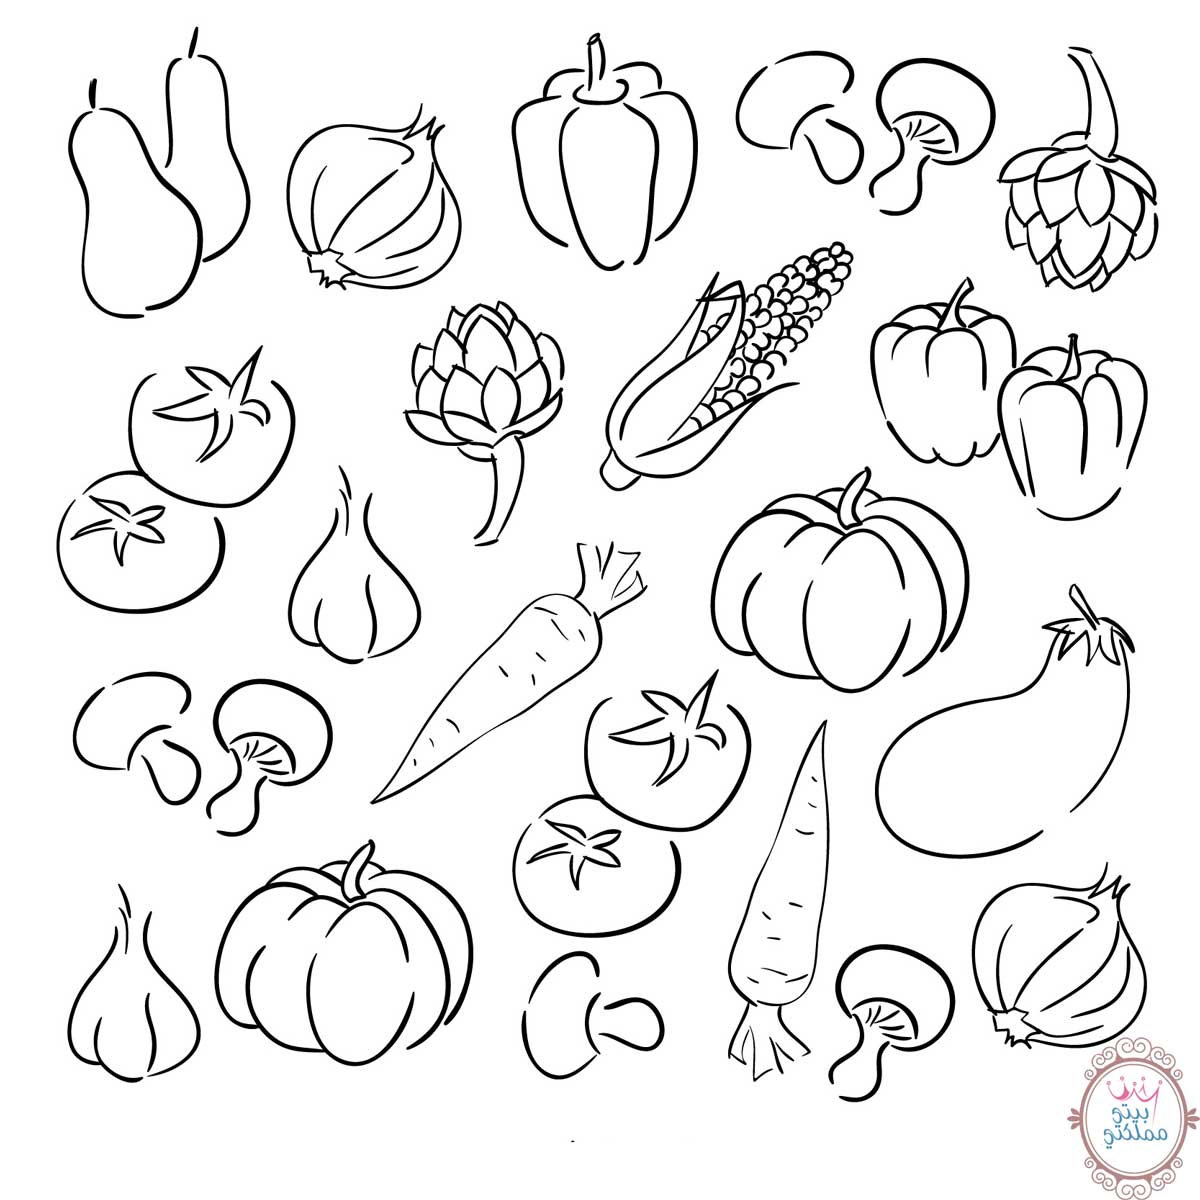 رسم خضروات للتلوين